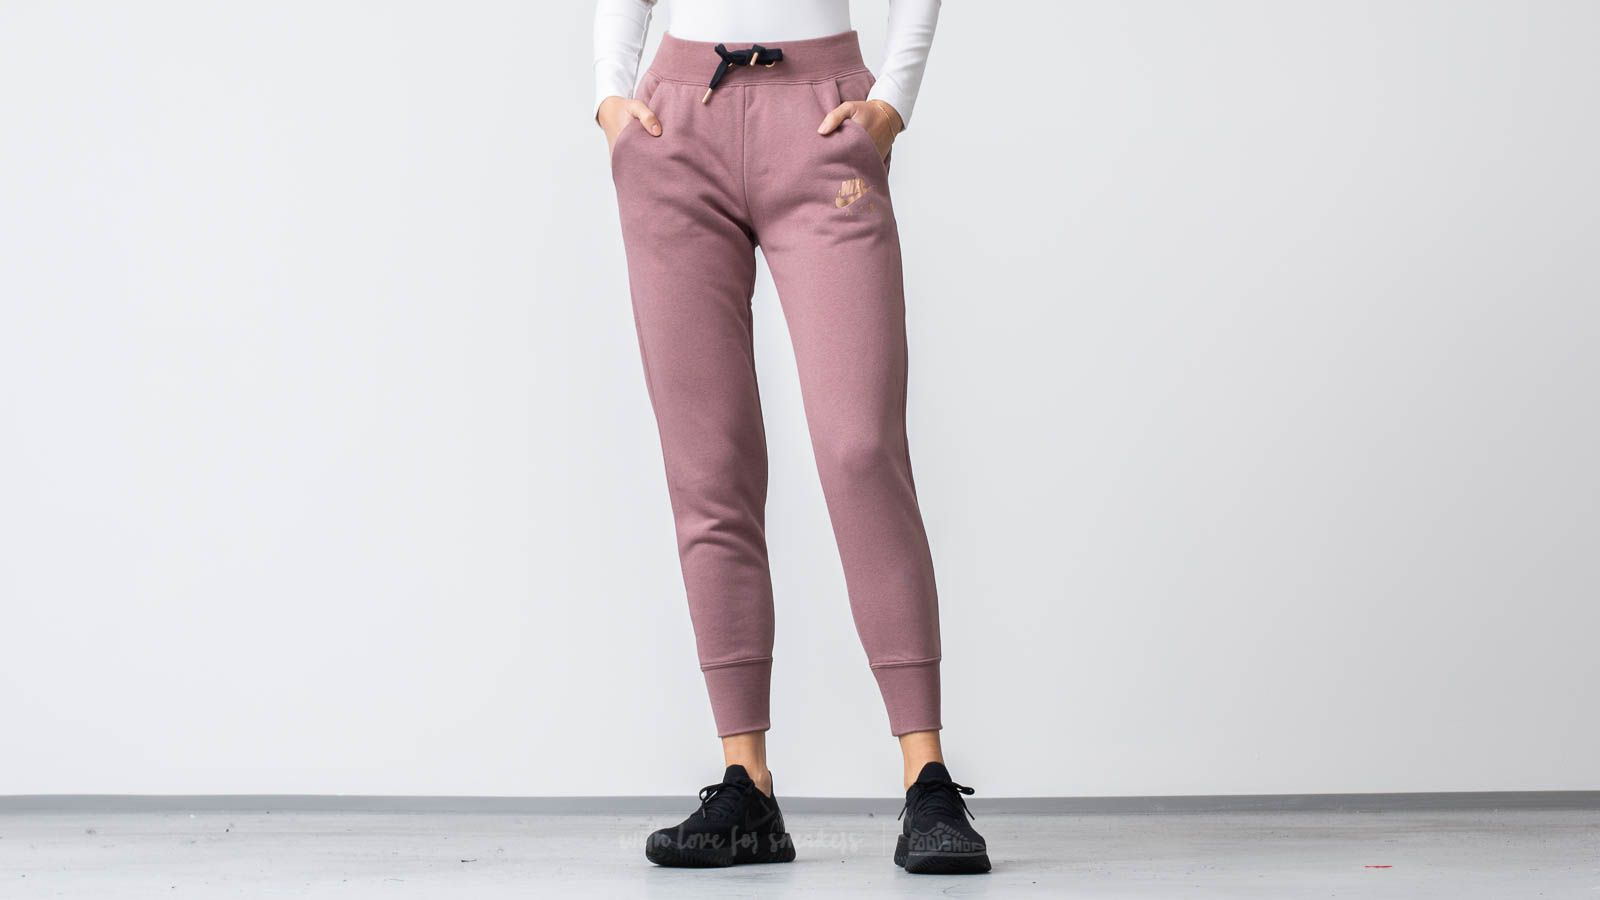 3026f0eb8 Nike Sportswear Air Fleece Pants Smokey Mauve/ Black | Footshop